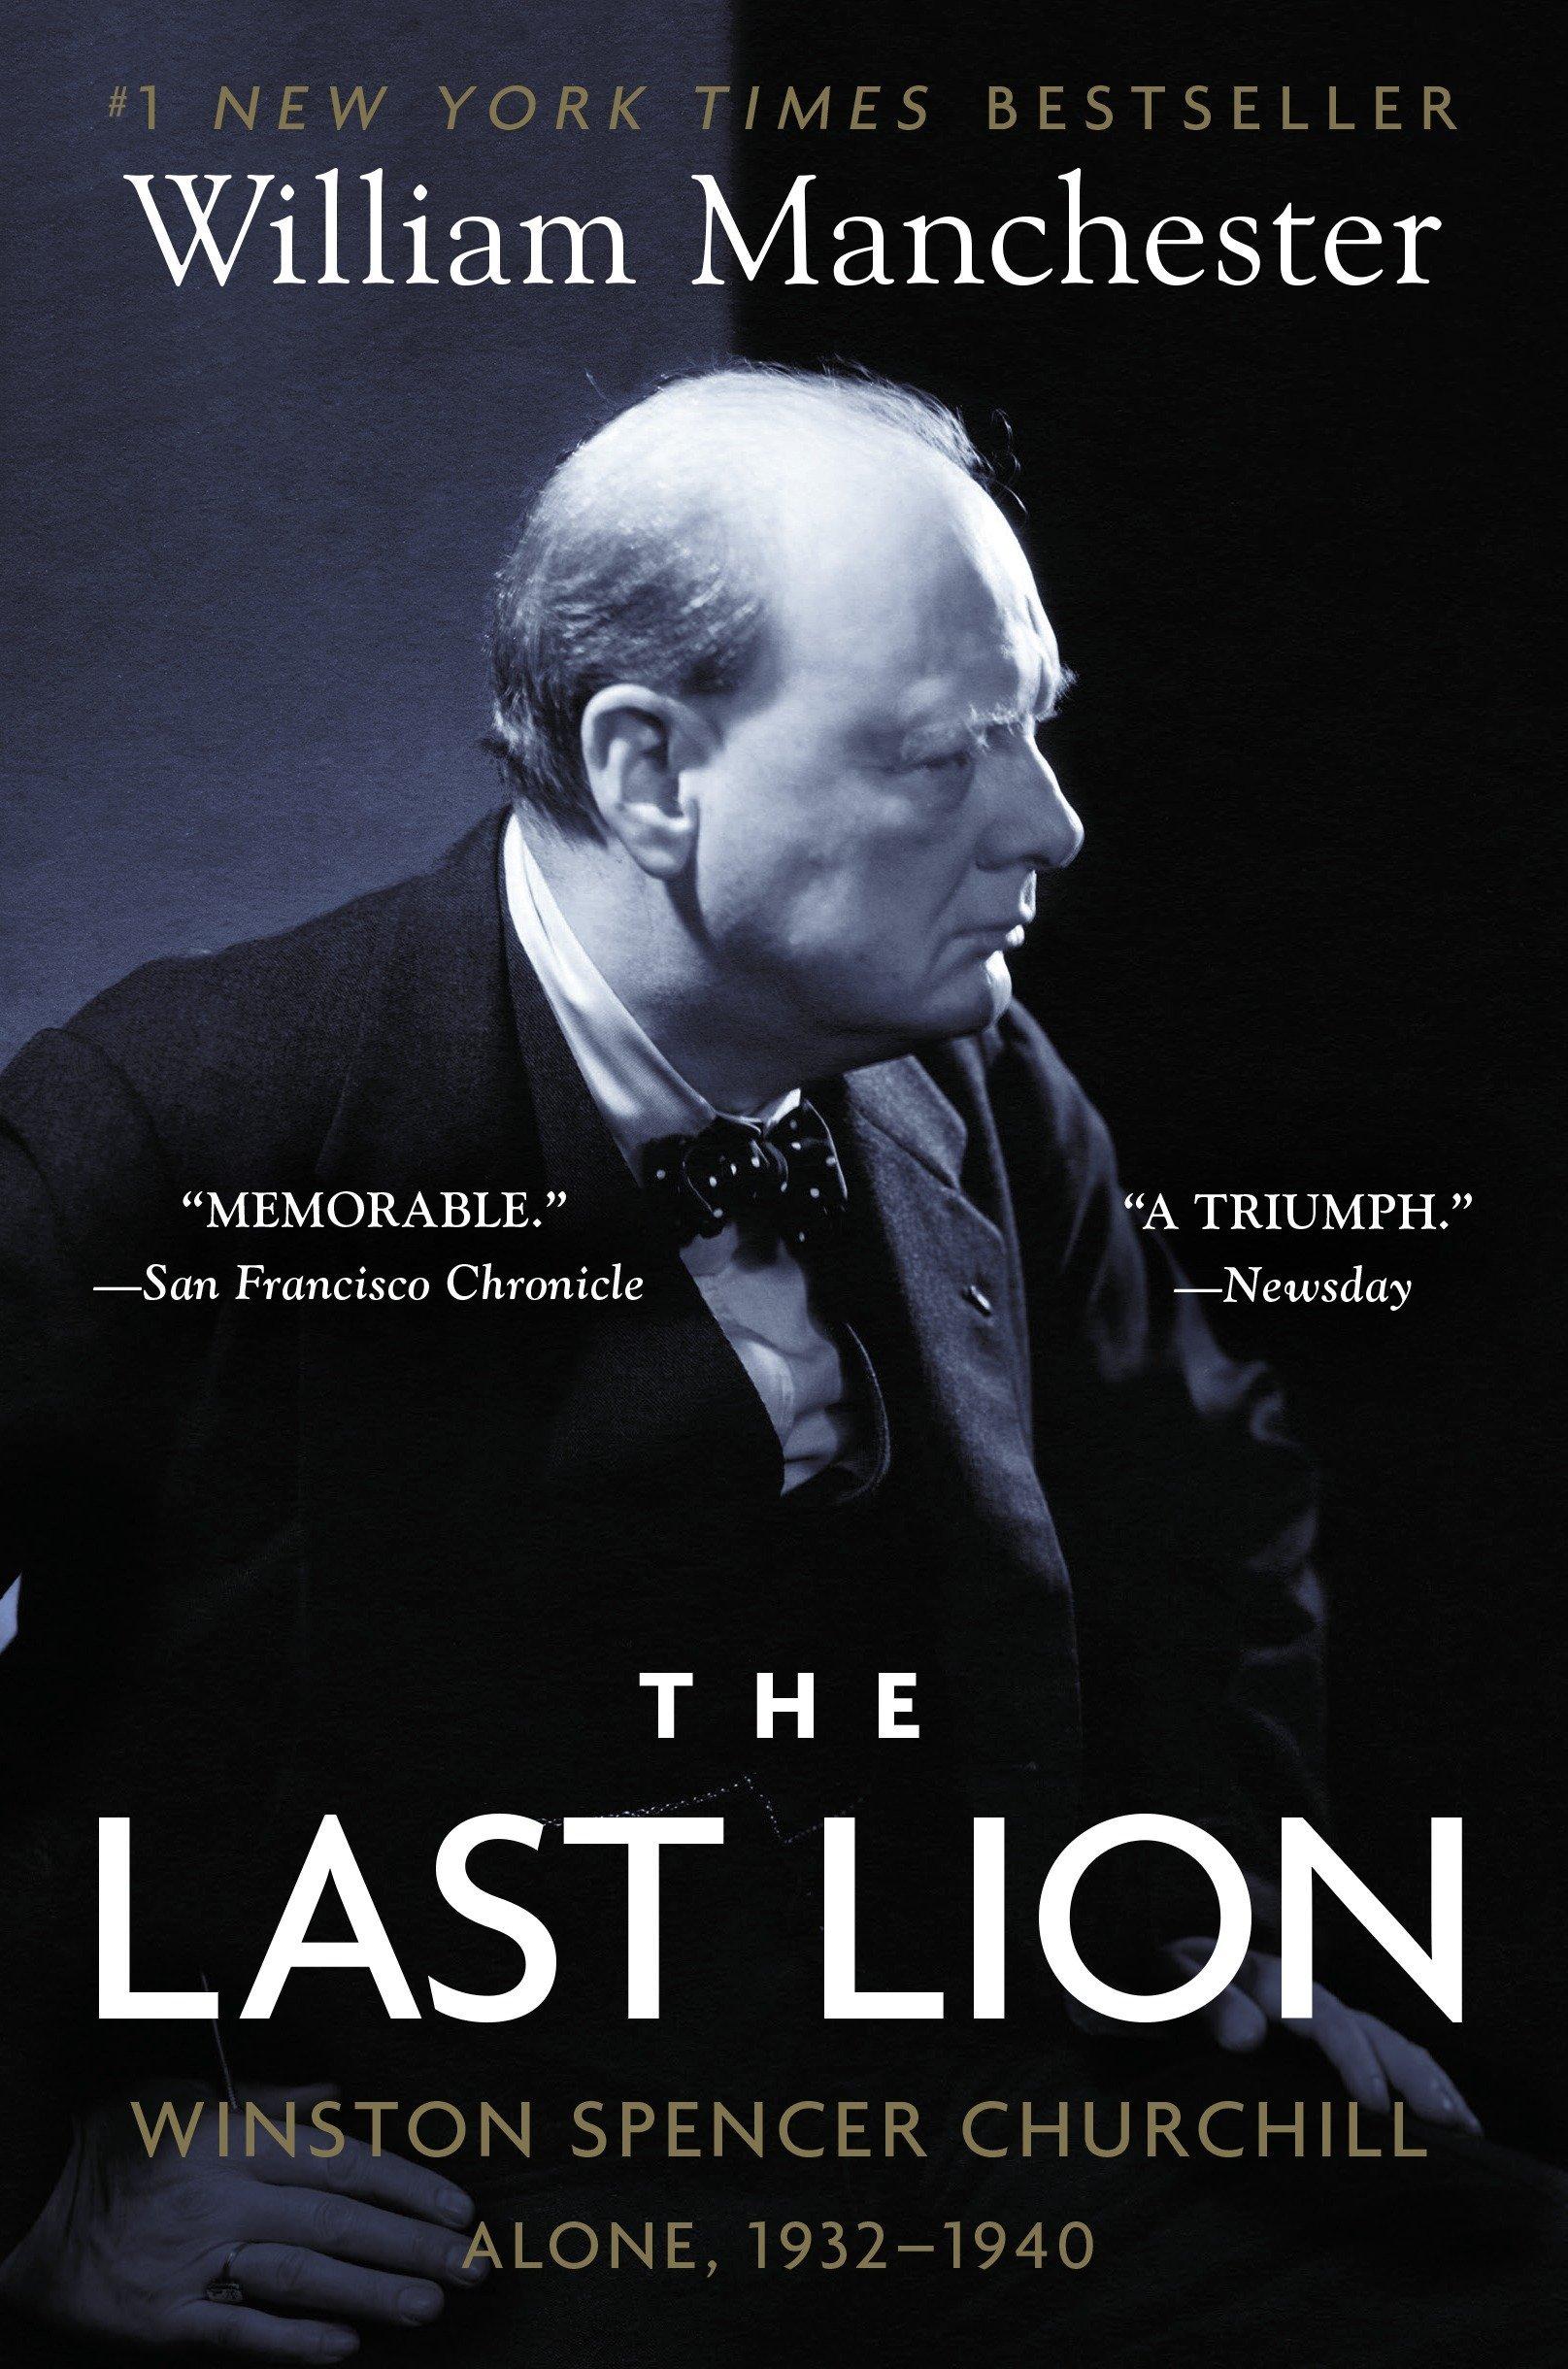 The Last Lion: Winston Spencer Churchill: Alone, 1932-1940 by Bantam